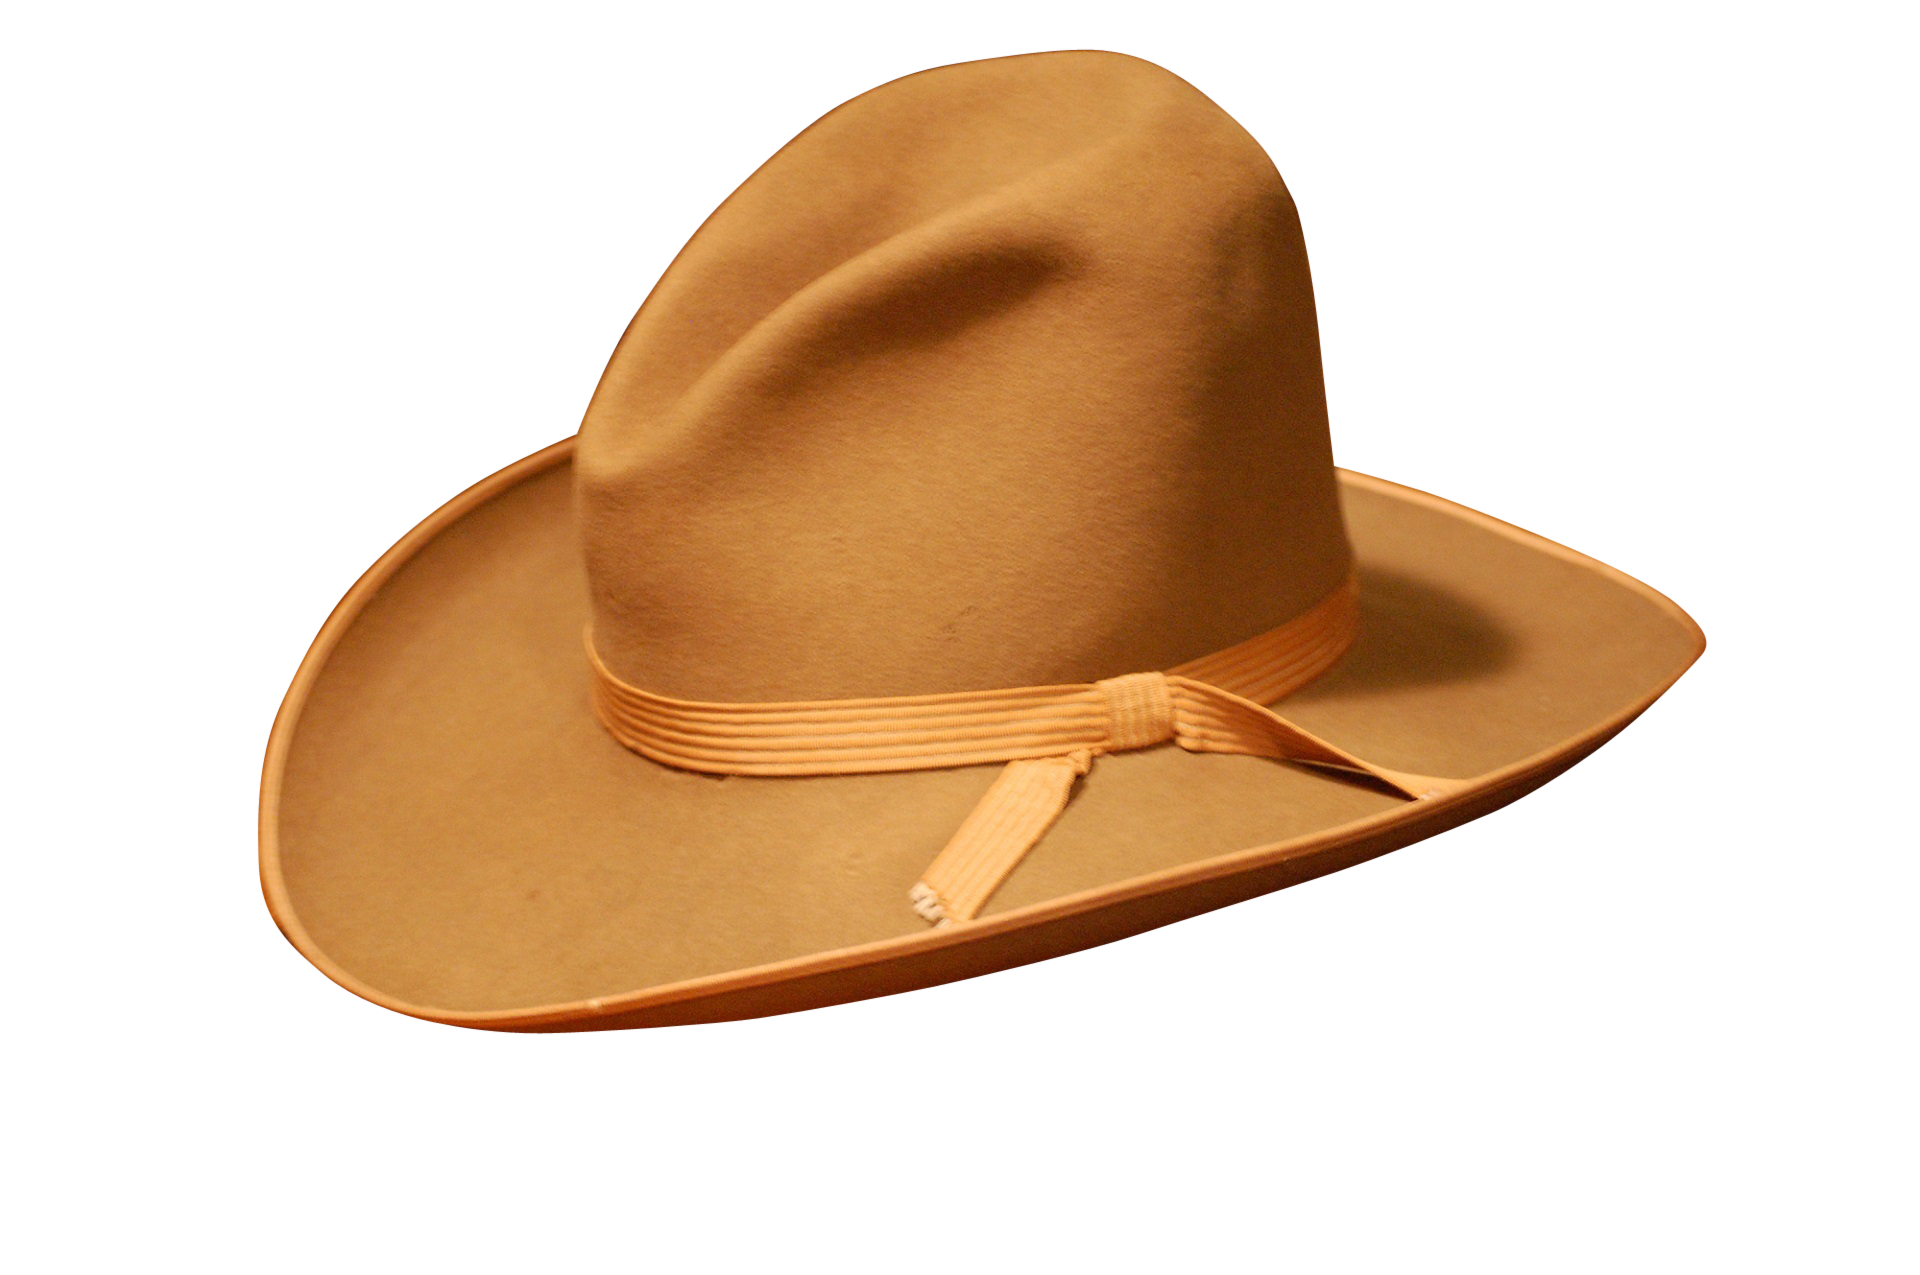 cowboy-hat-1248600_Clip